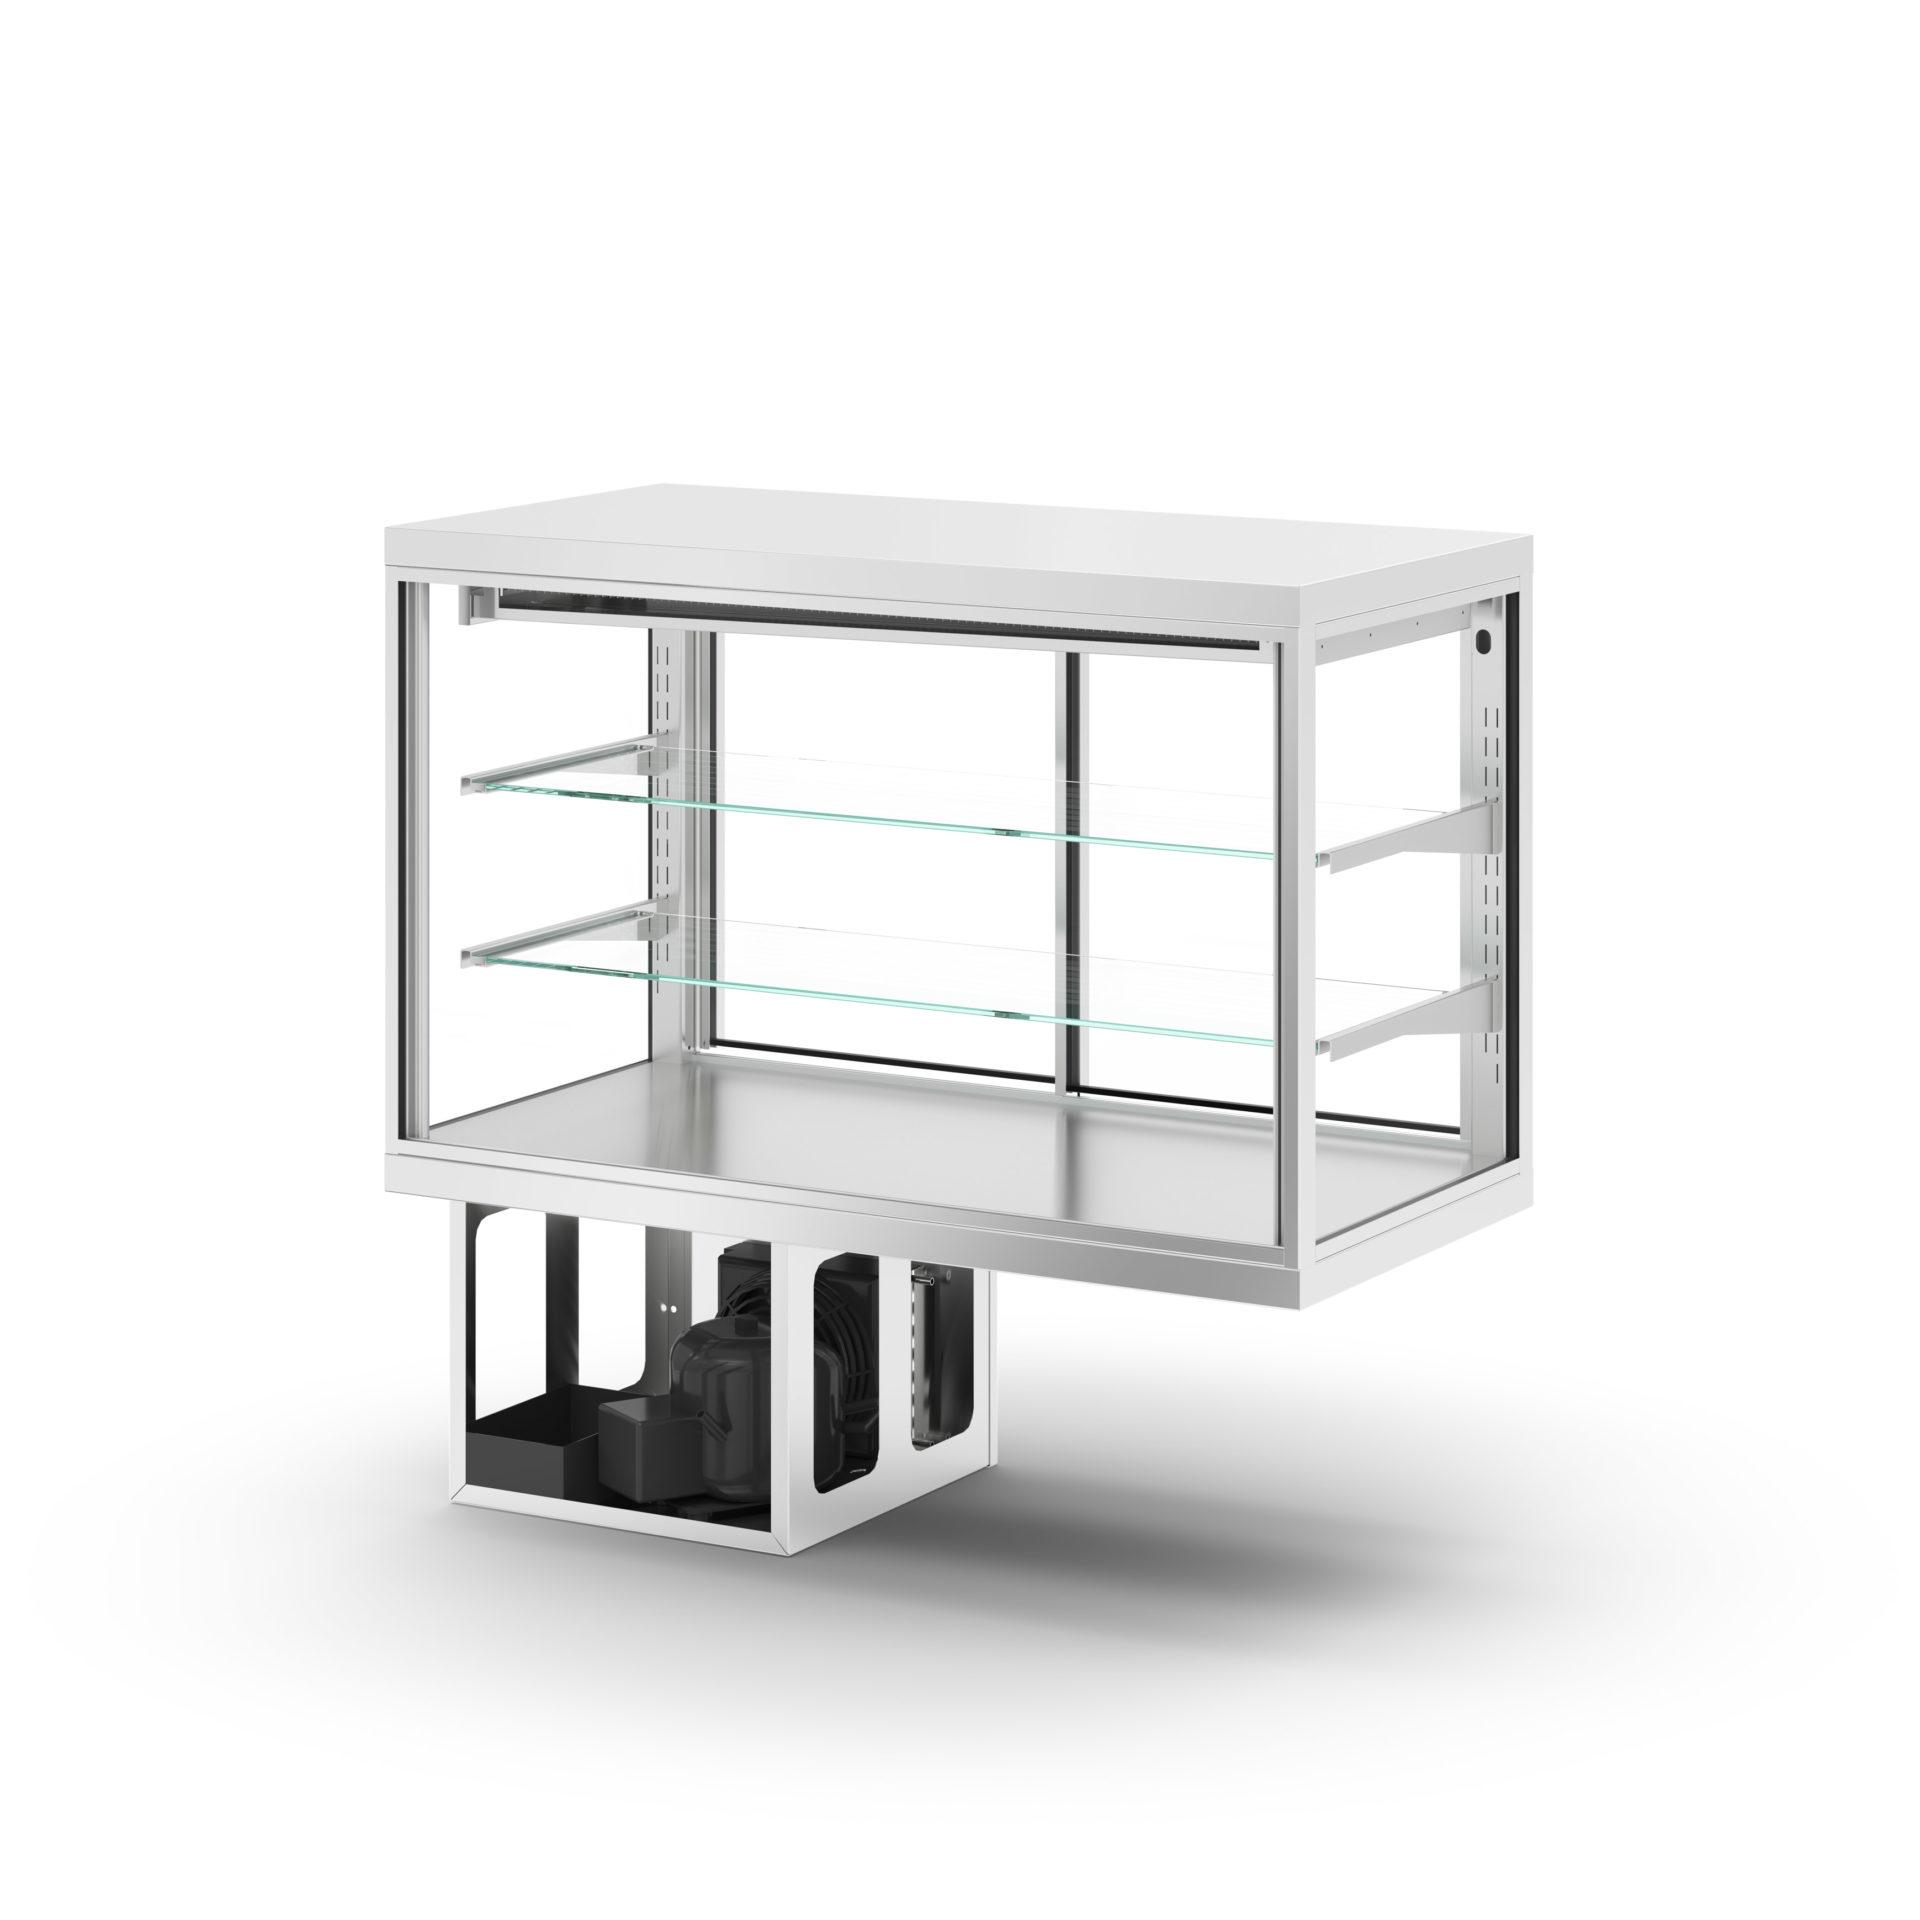 Chladící vitrína MODUS B MO080565FB2F10 samoobslužná 800 x 500 x 650 mm